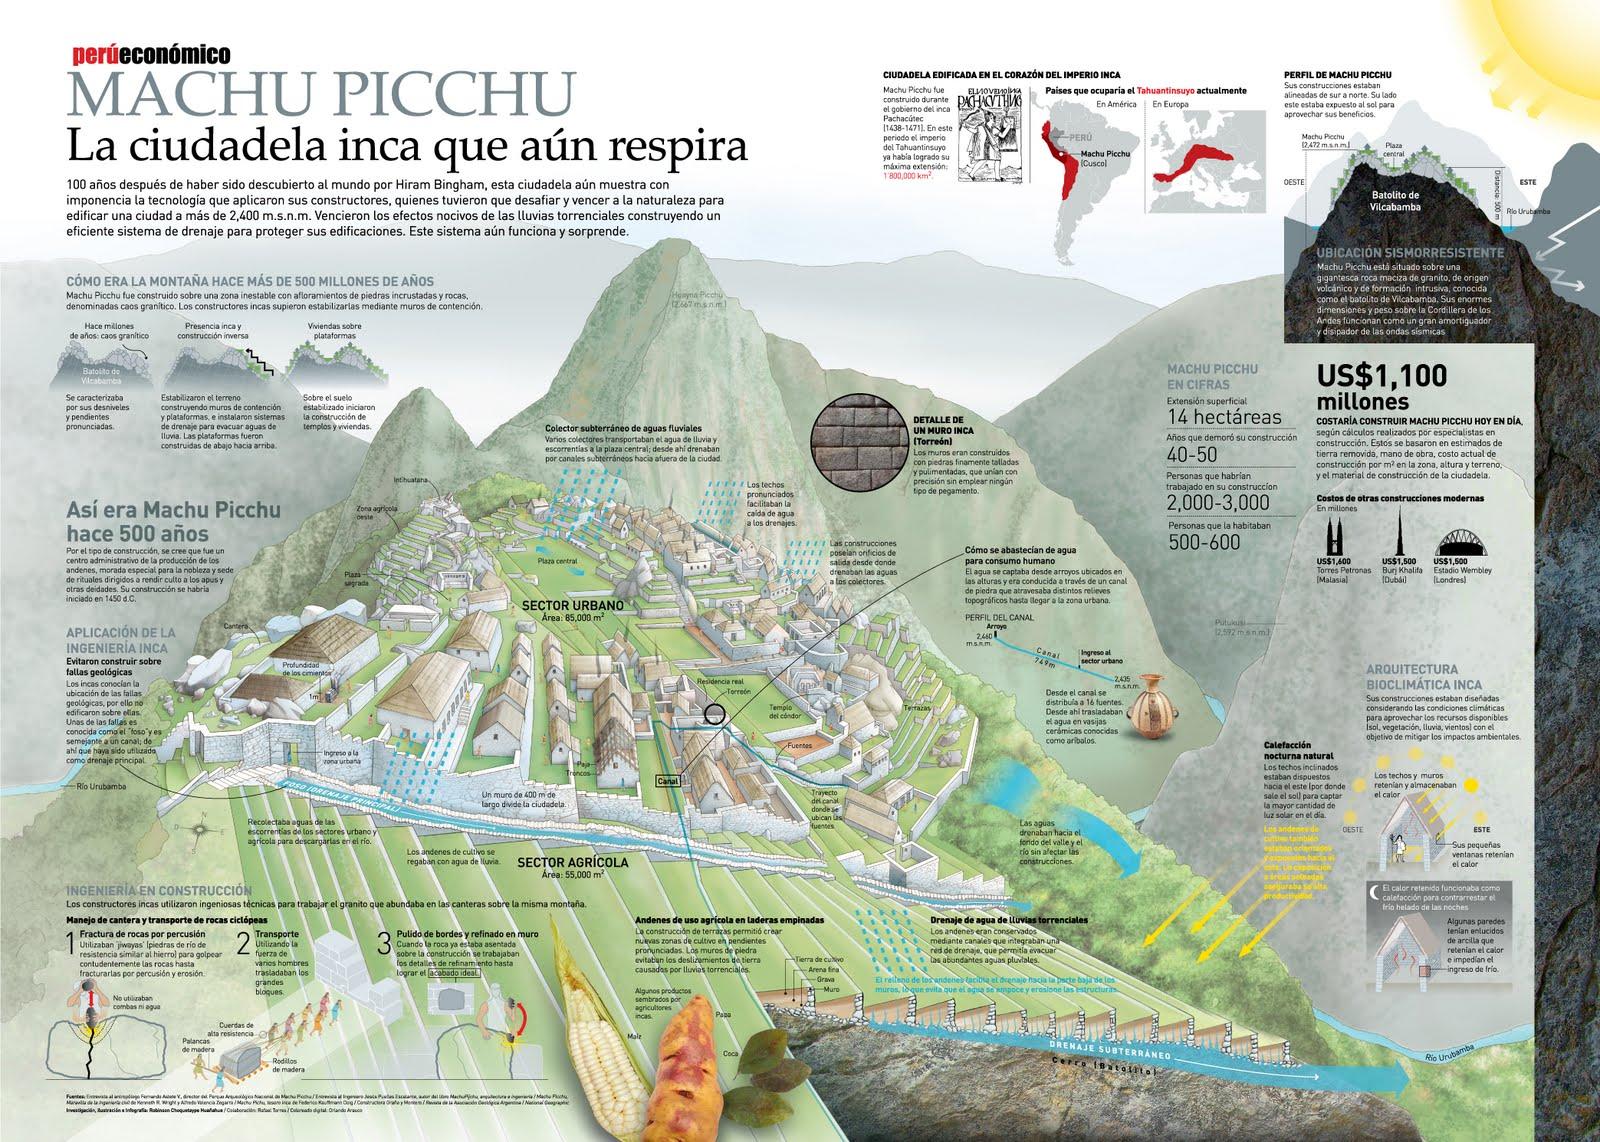 Machu Picchu La Ciudadela Inca Que Aun Respira Machu Picchu Historia De Peru Y Geografia E Historia